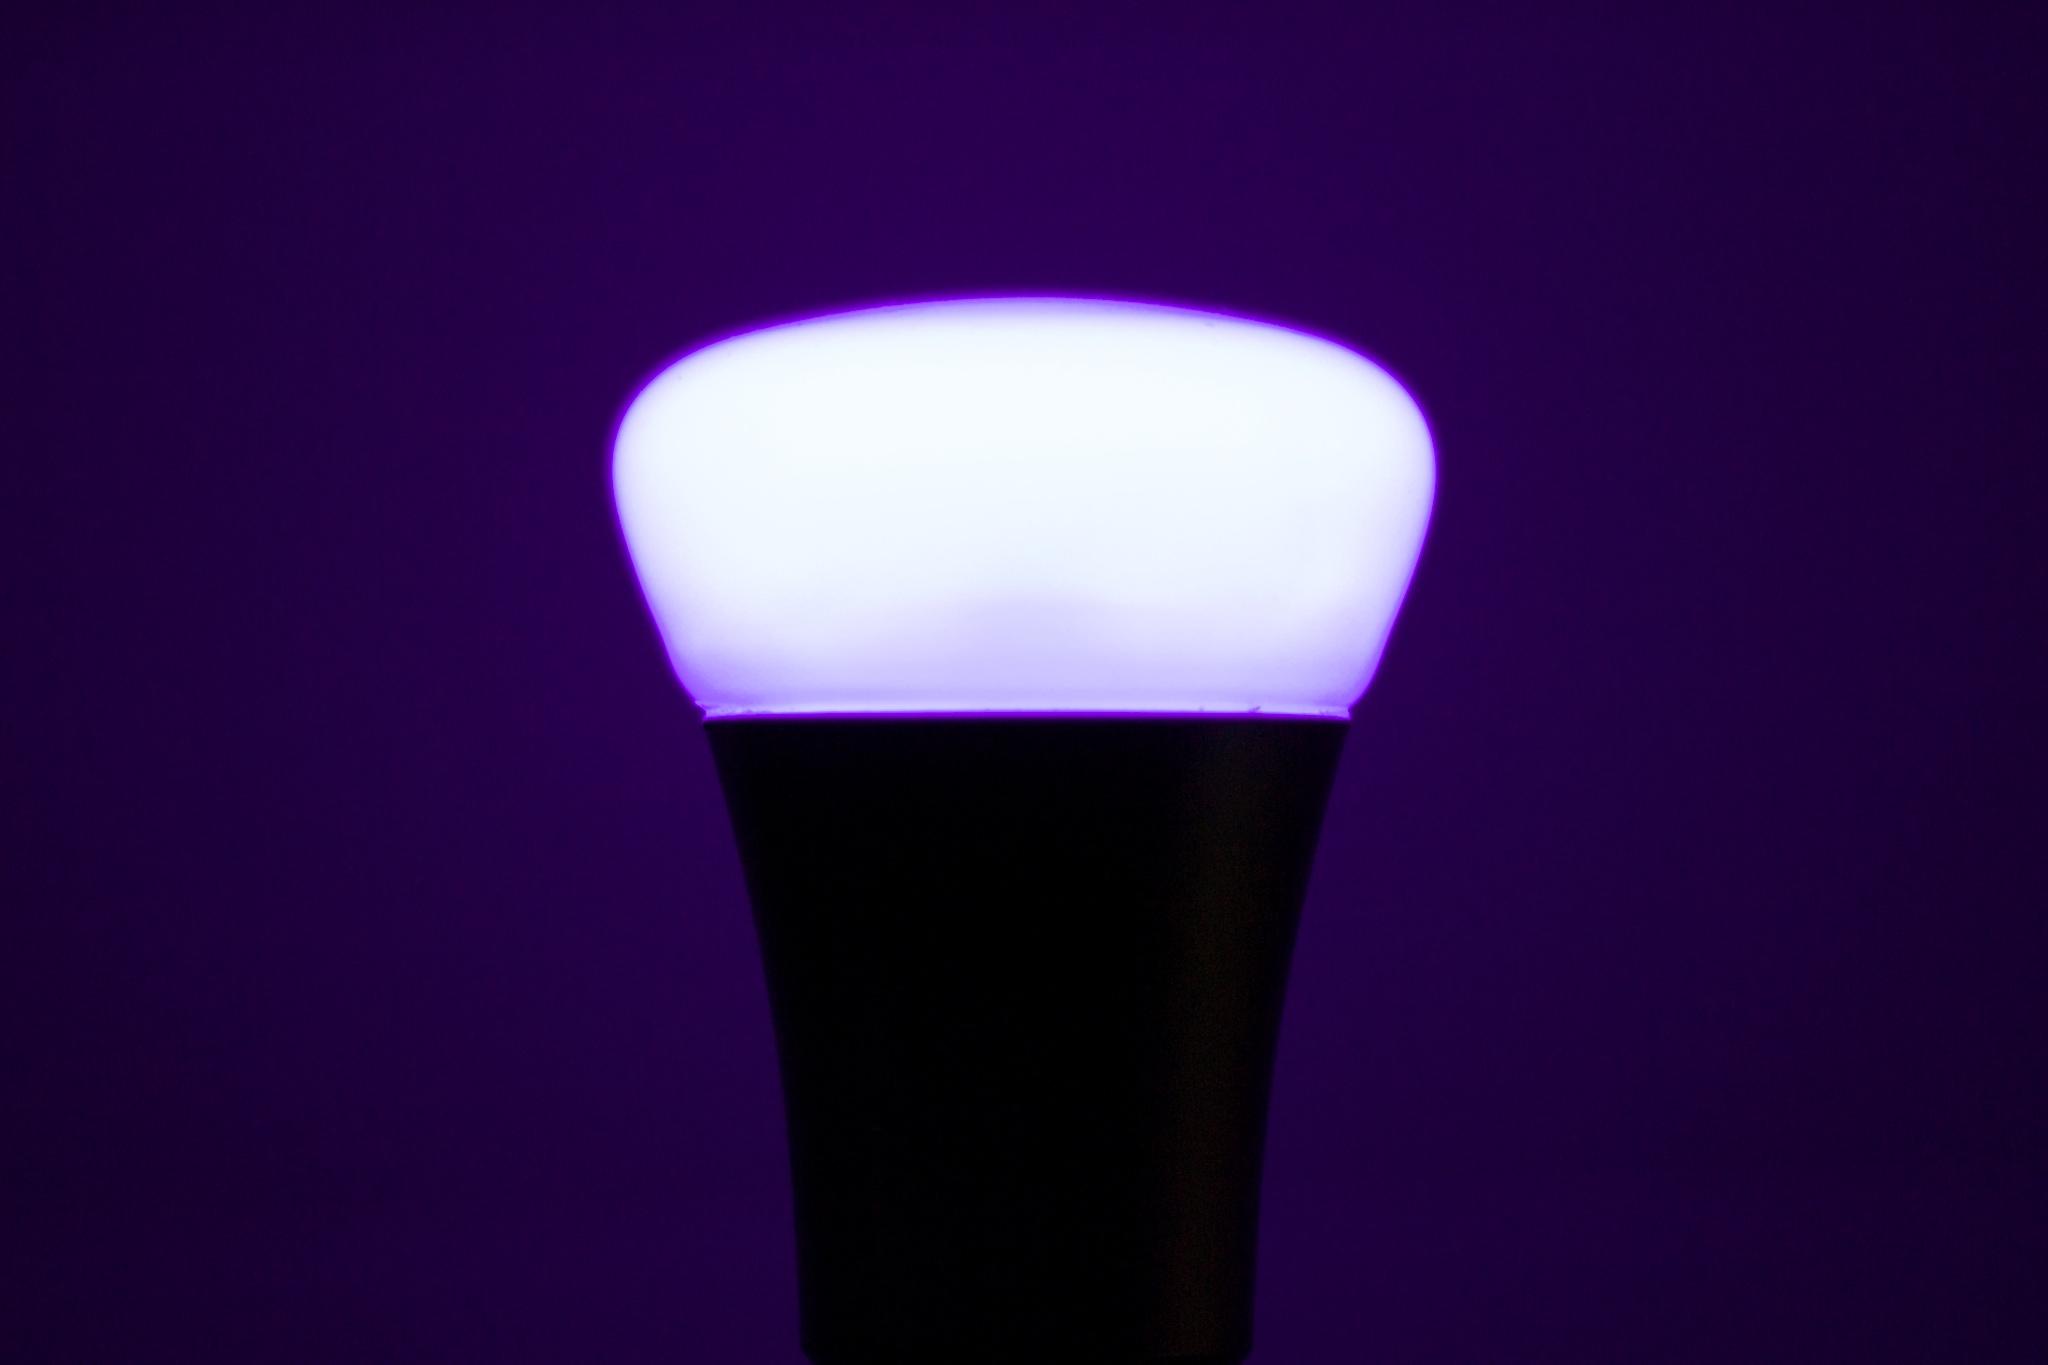 Home lighting designer philips - Home decor ideas